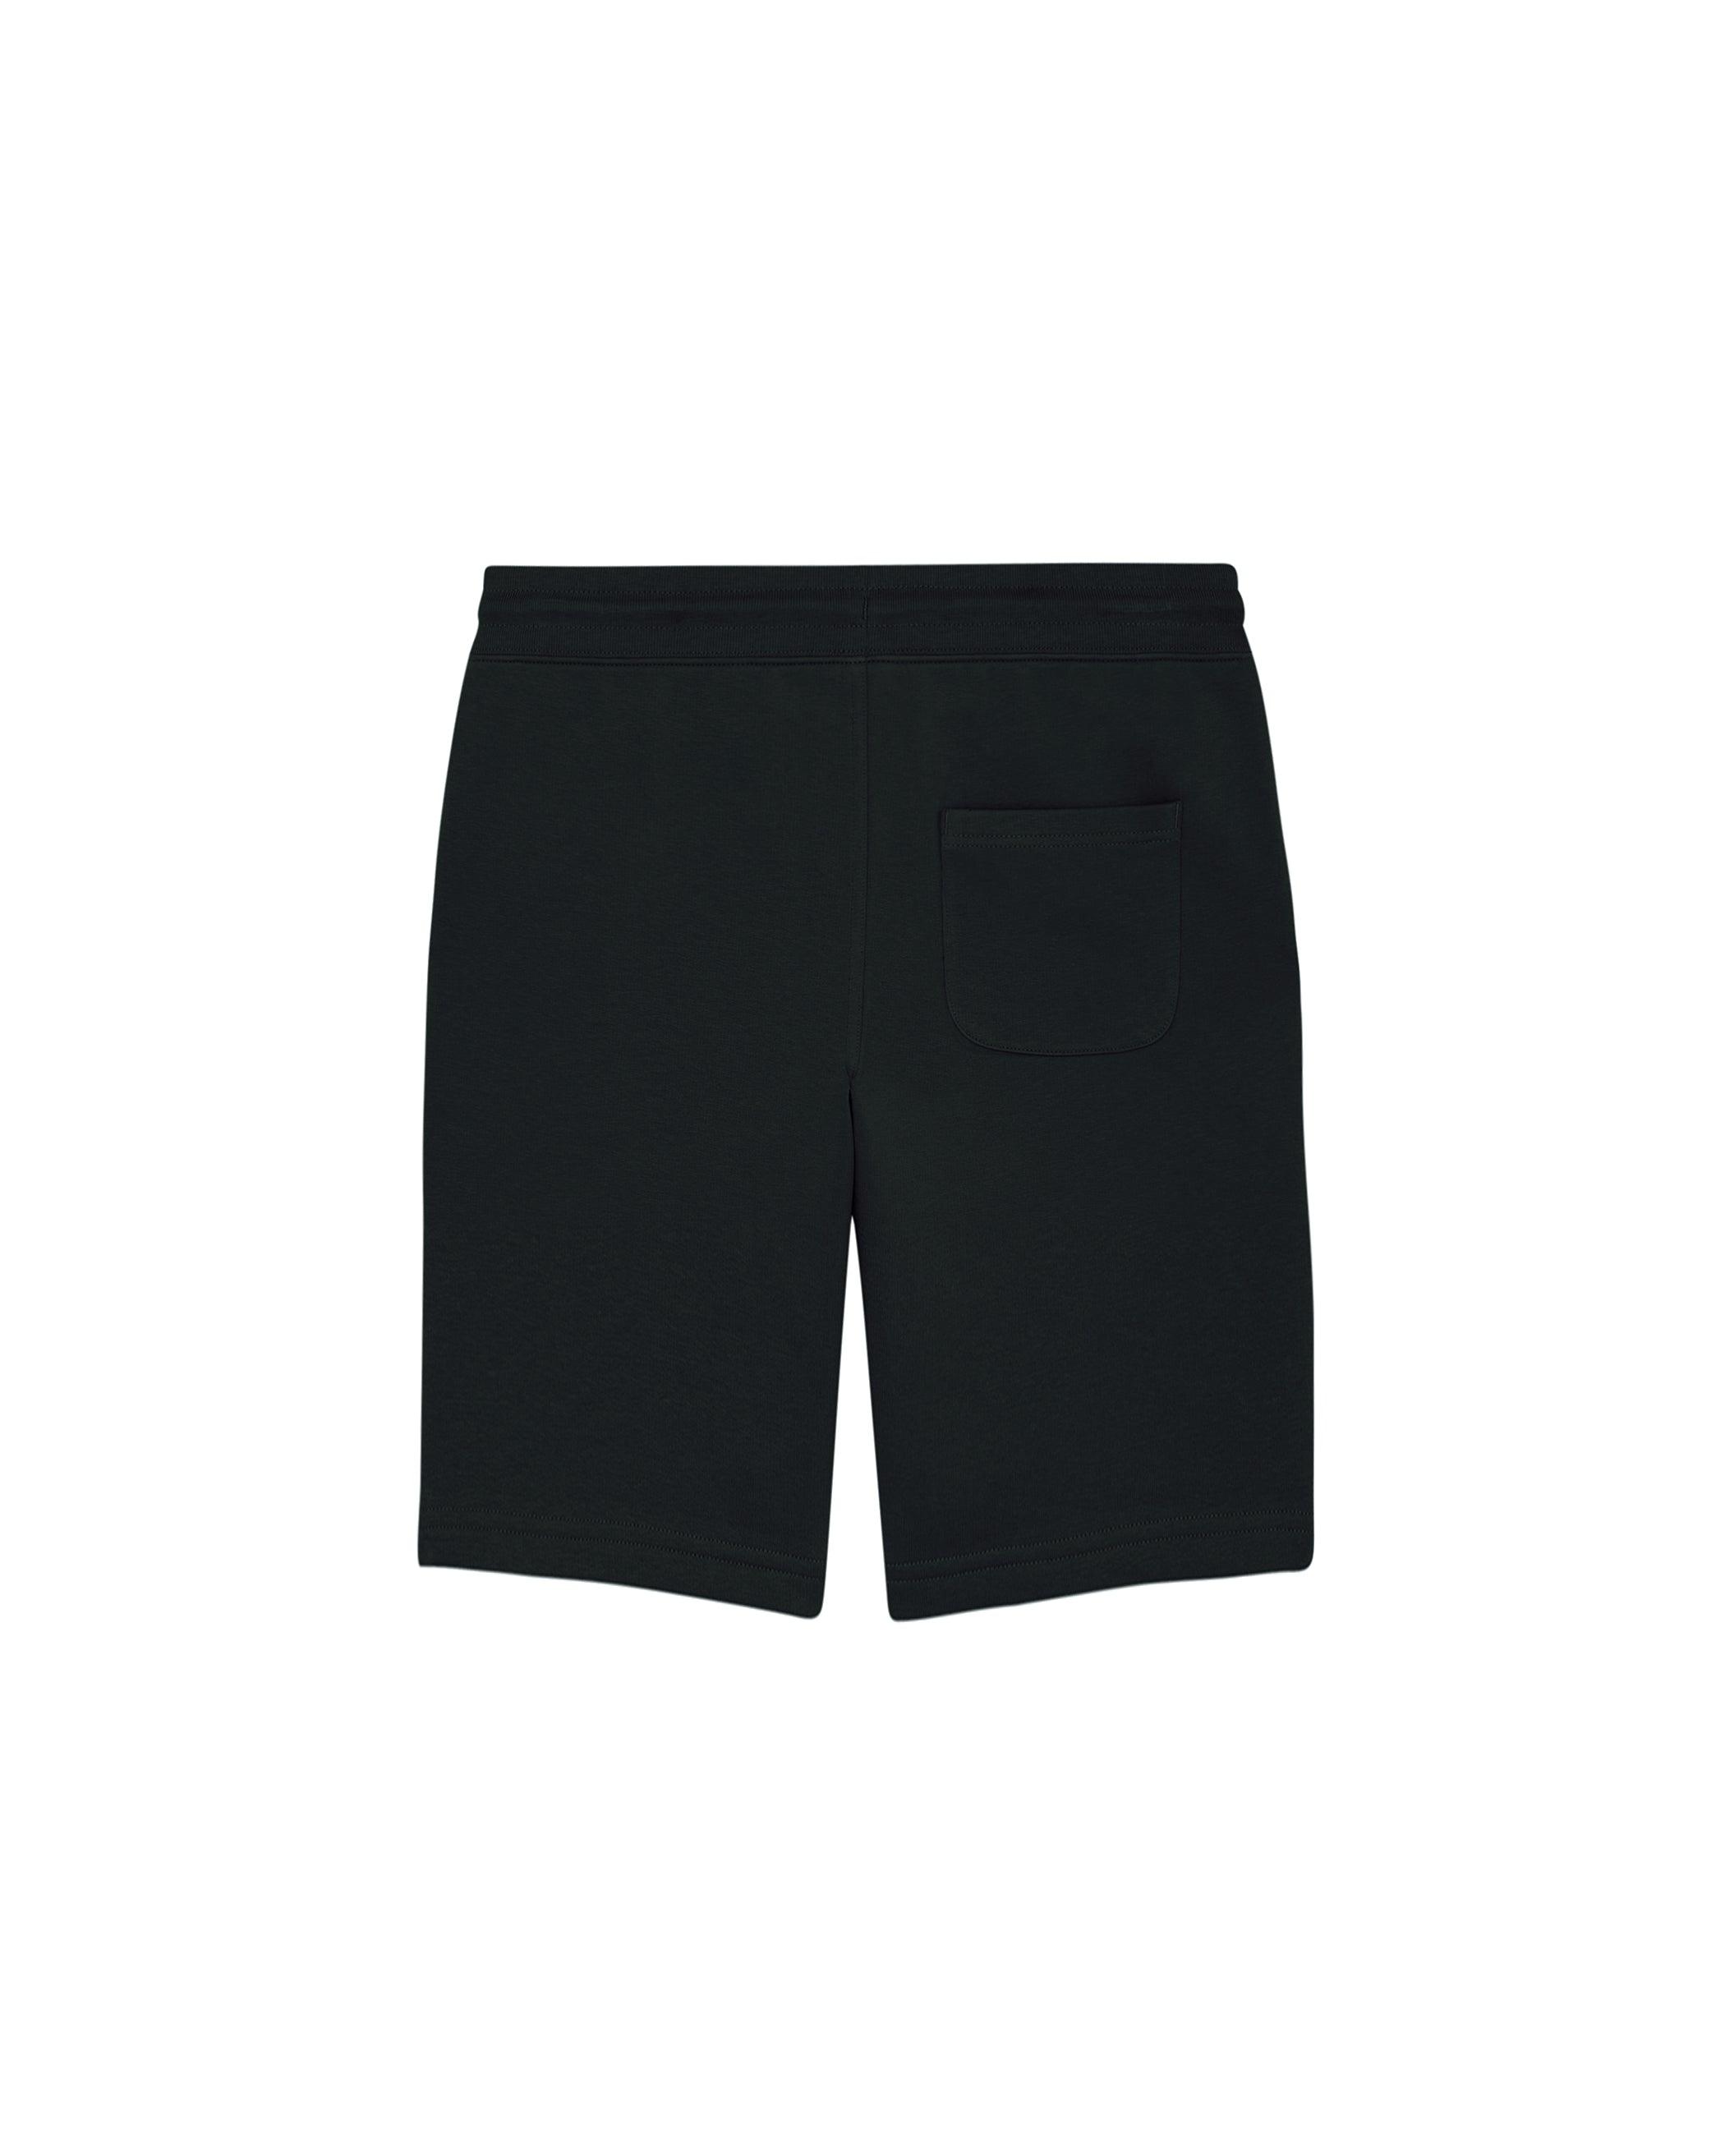 Goat Organic Apparel Savi Logo Shorts Black